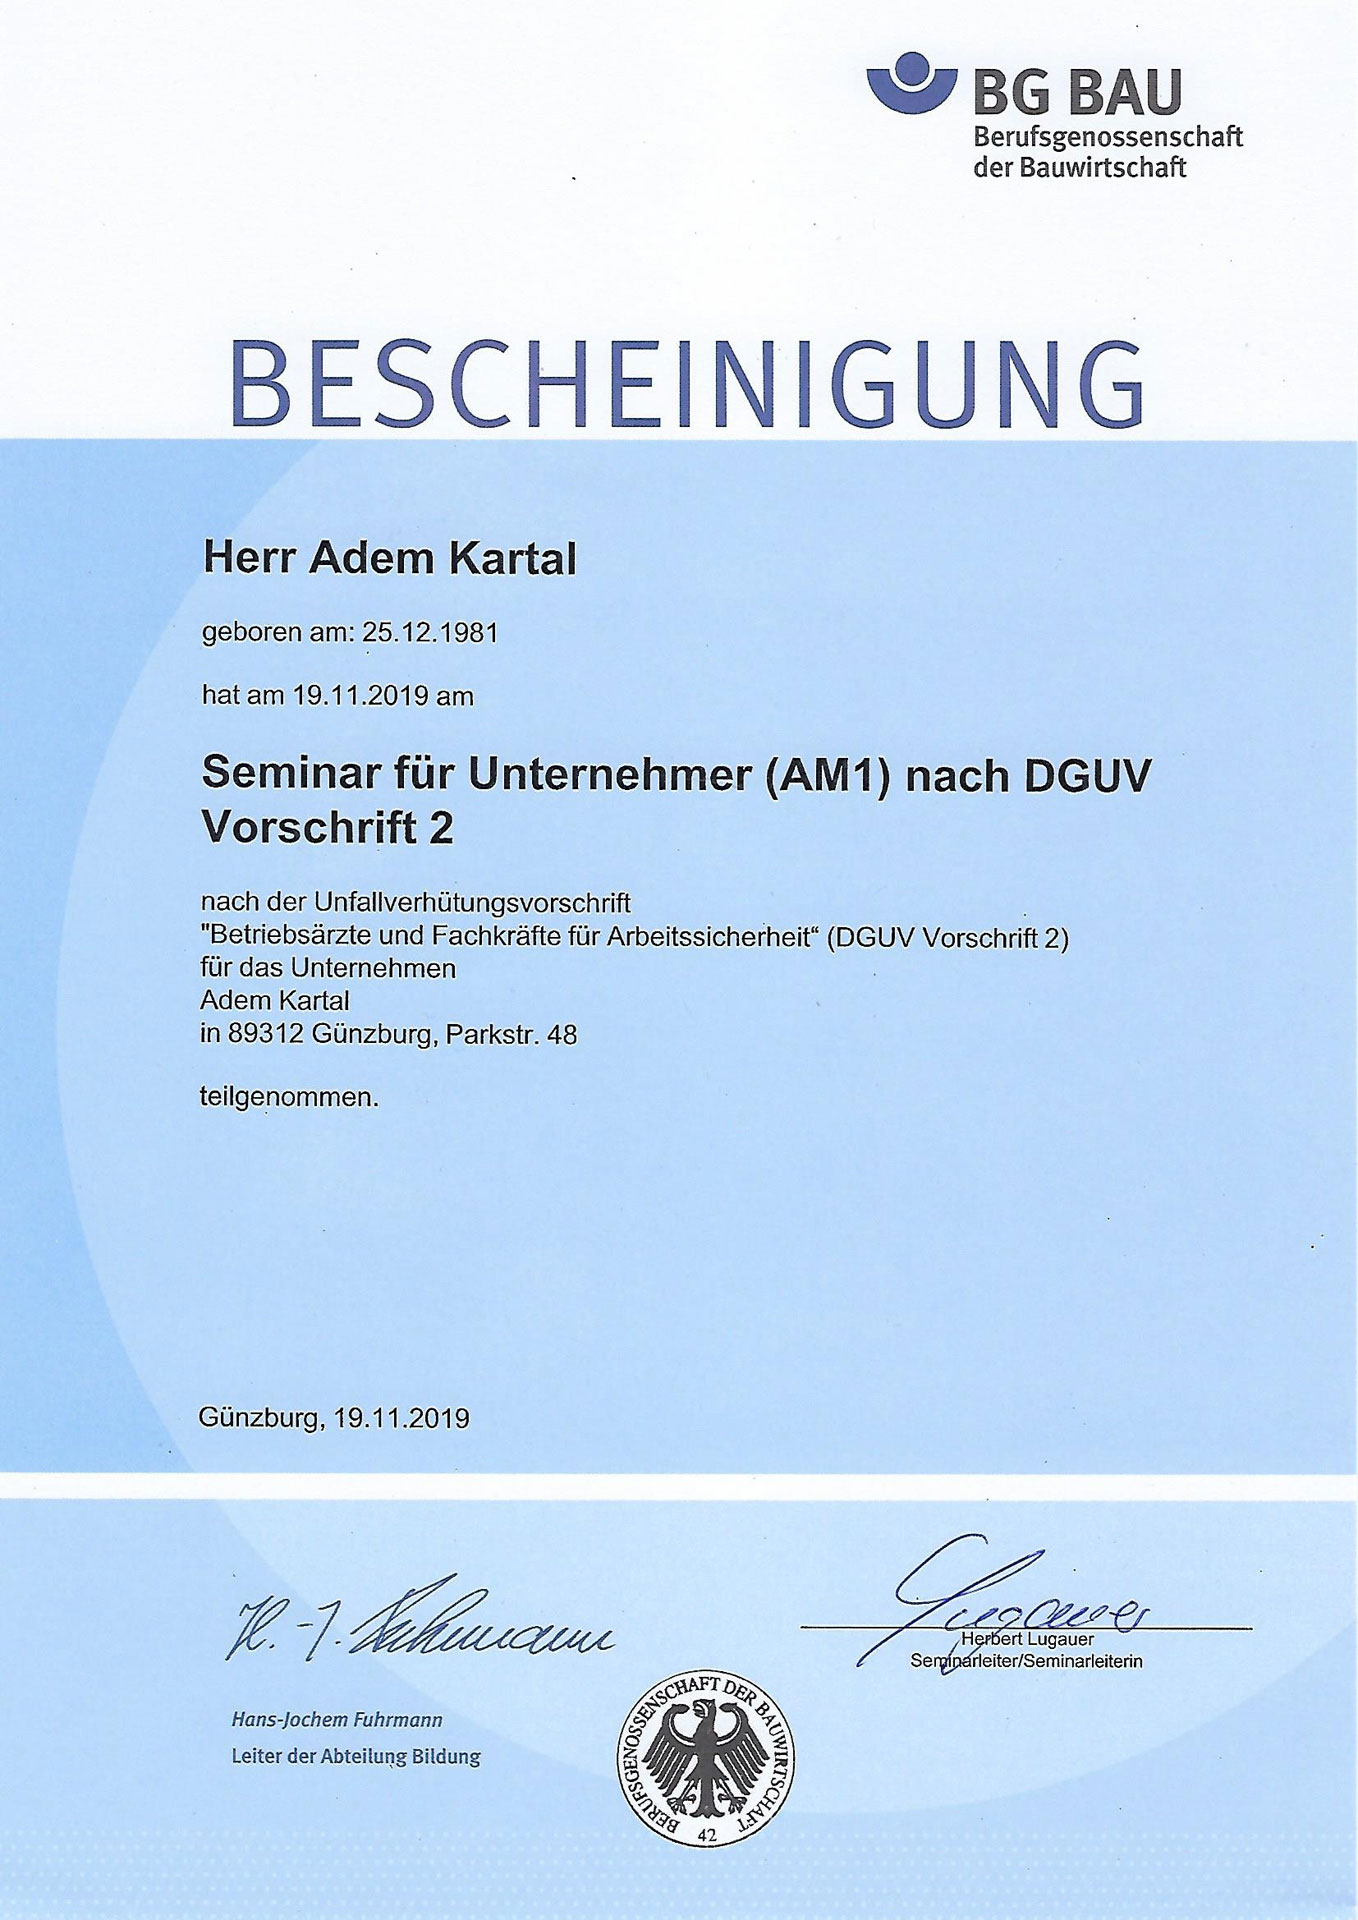 BG-Bau-Zertifikat